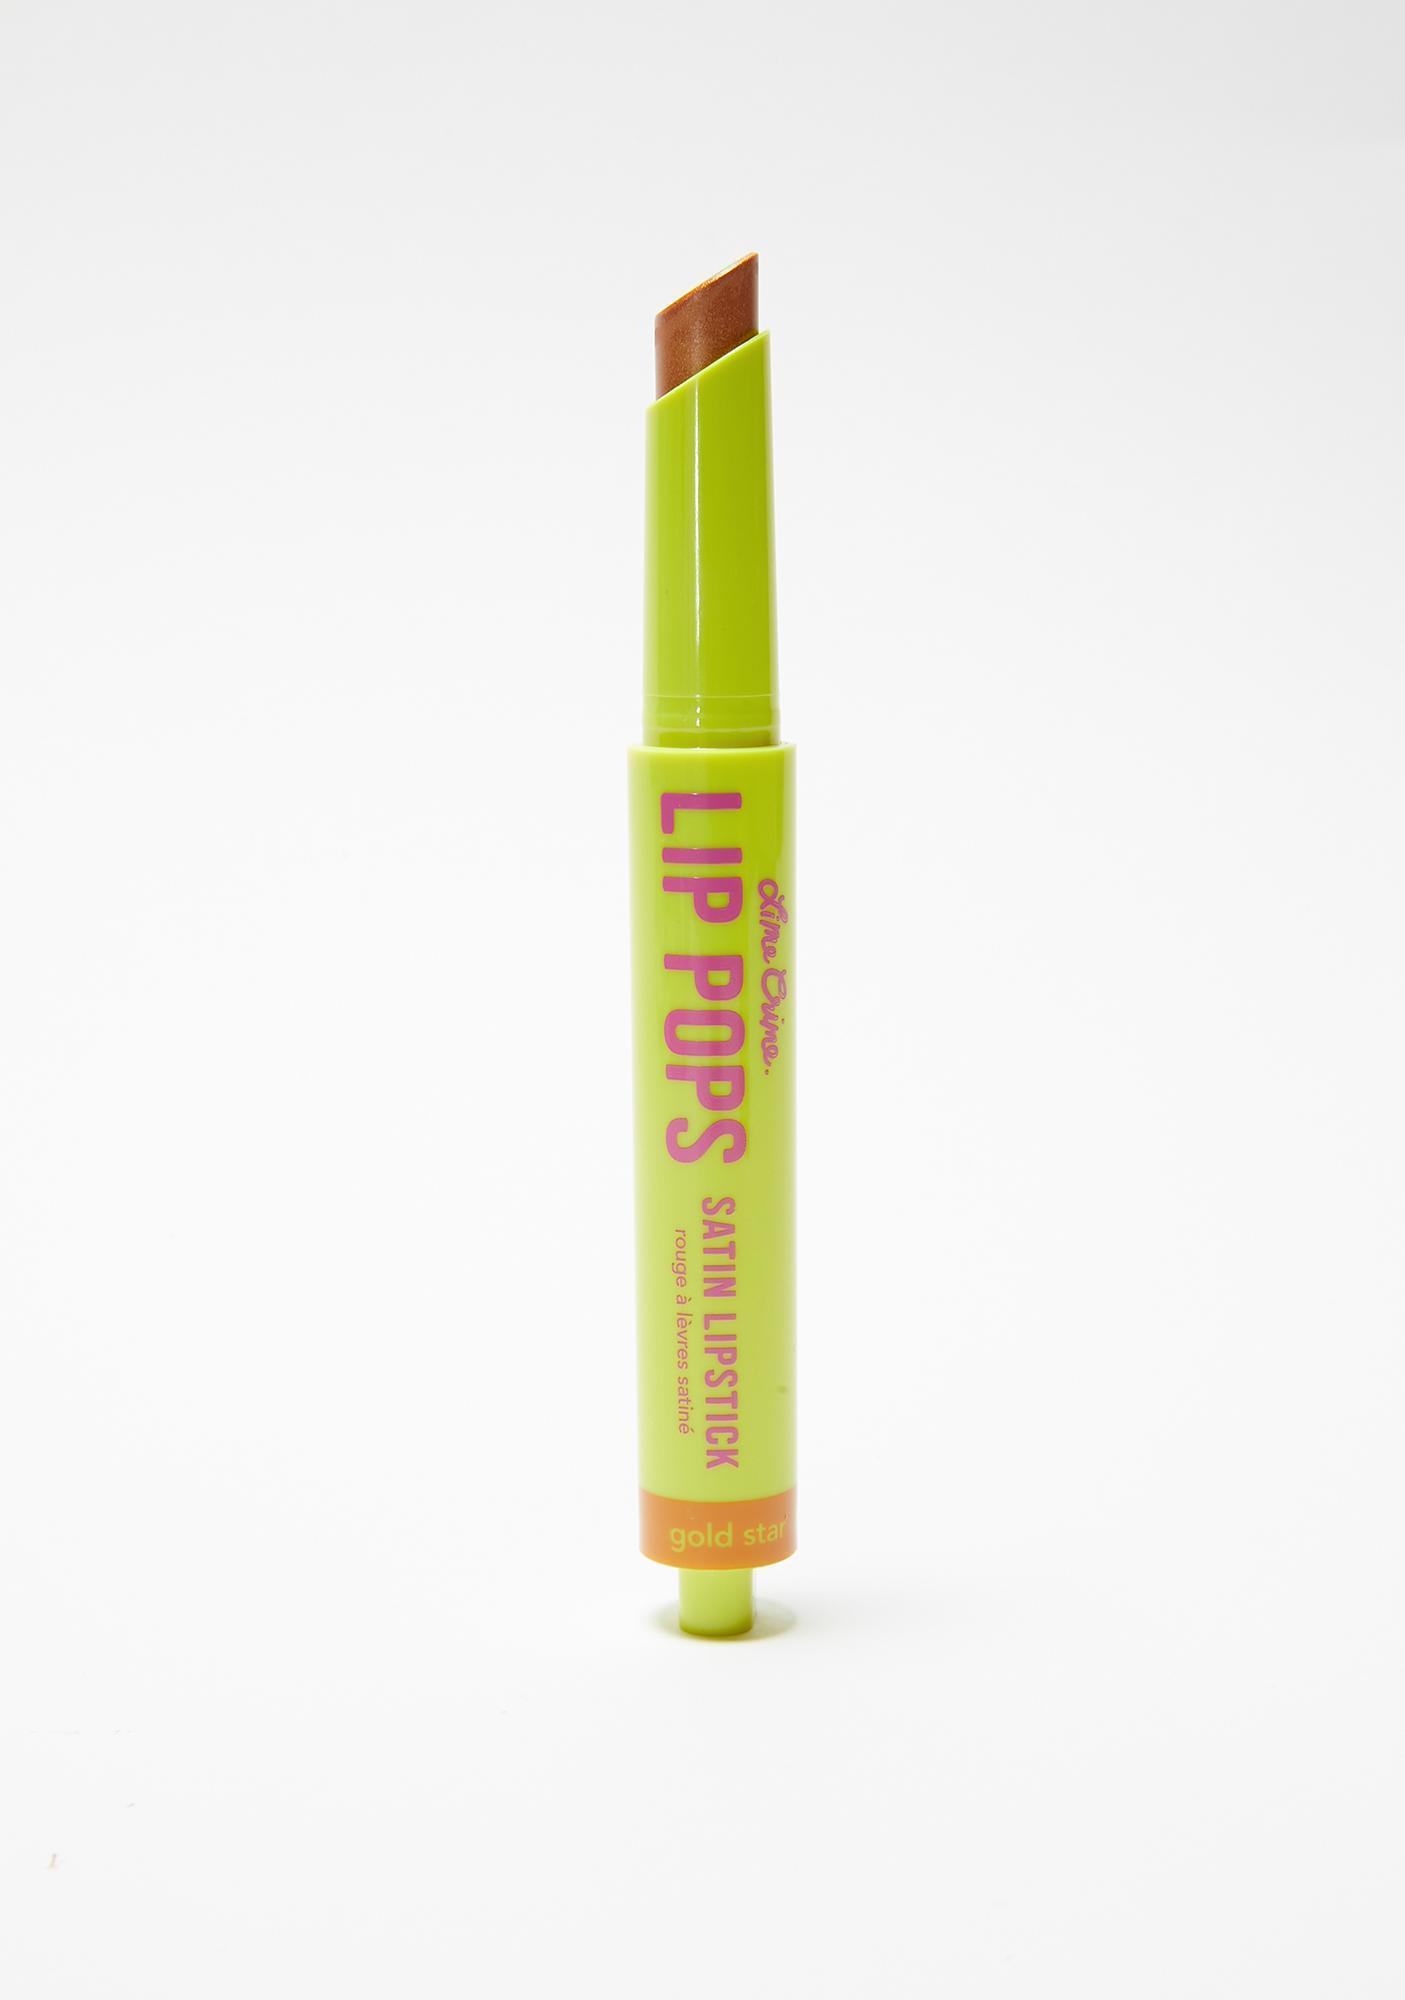 Lime Crime Gold Star Lip Pops Satin Lipstick